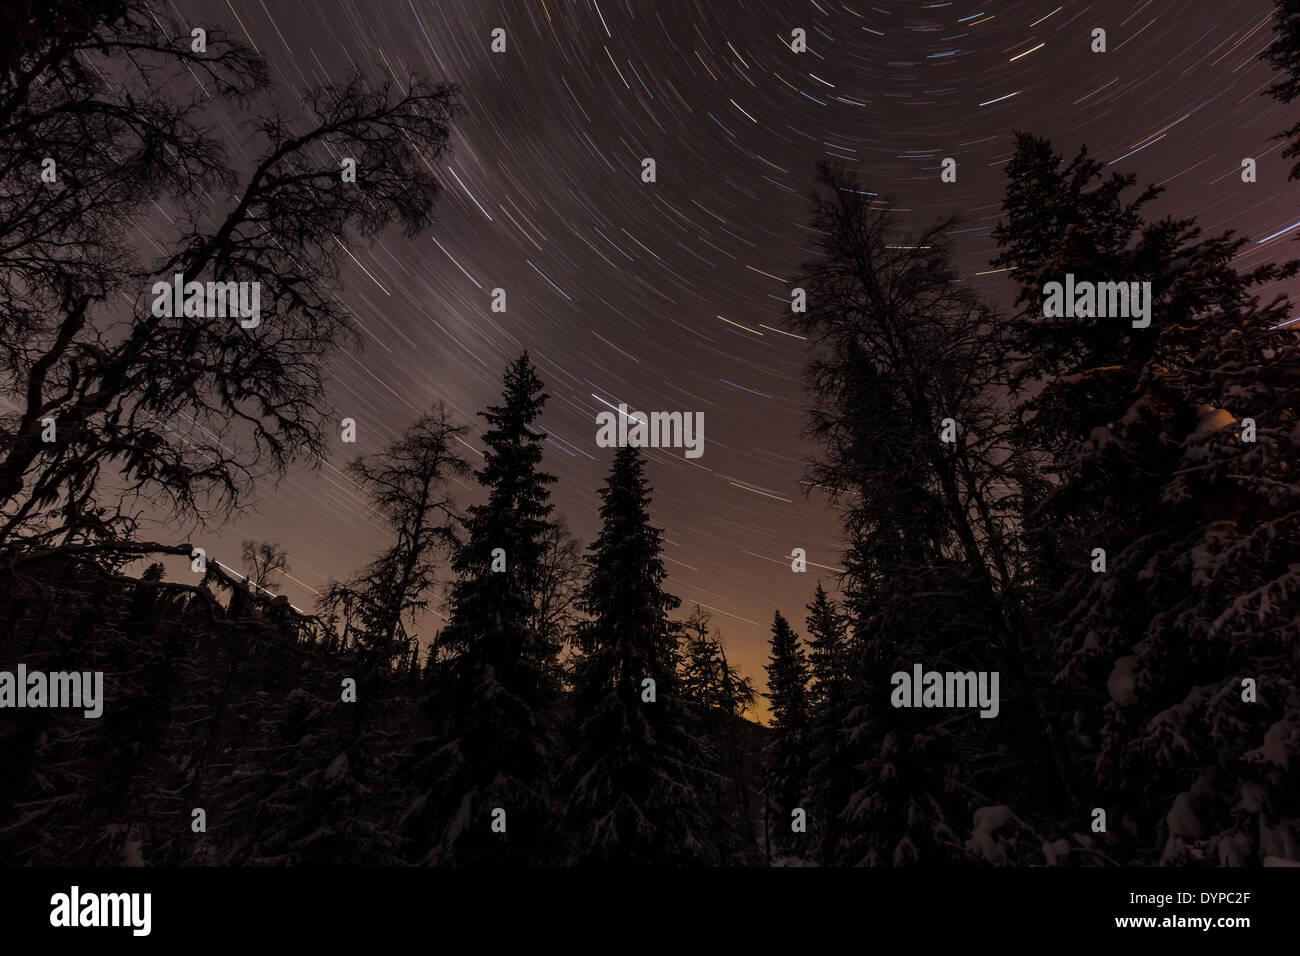 Star trails at Korouoma, Posio, Finland, EU - Stock Image